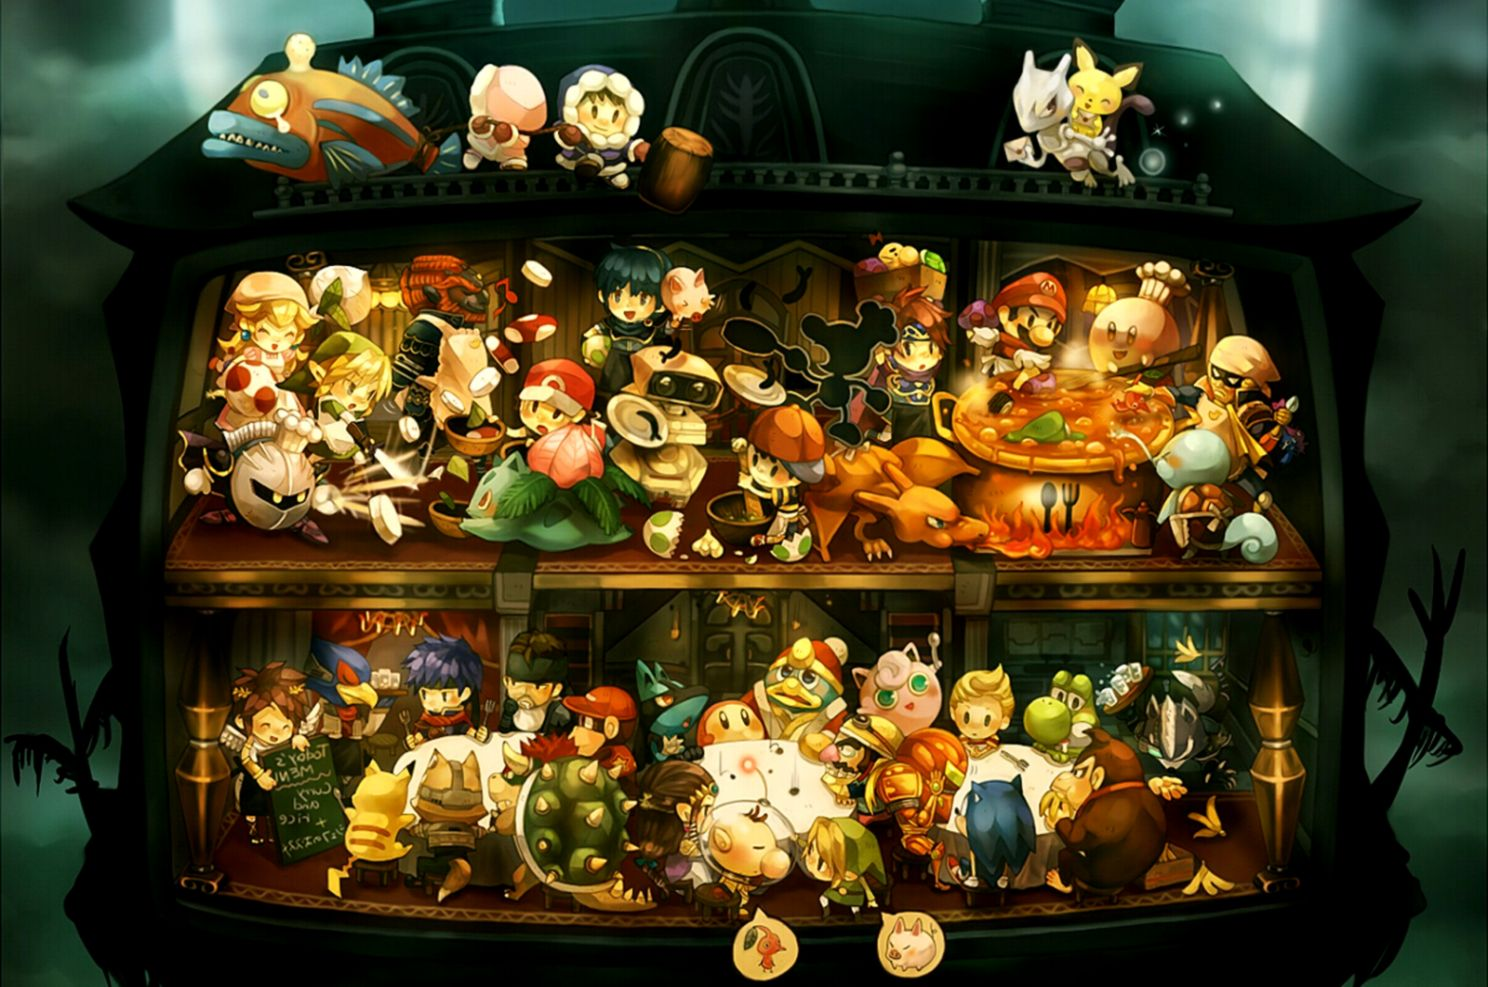 Nintendo HD Wallpaper 16 1600 X 1050